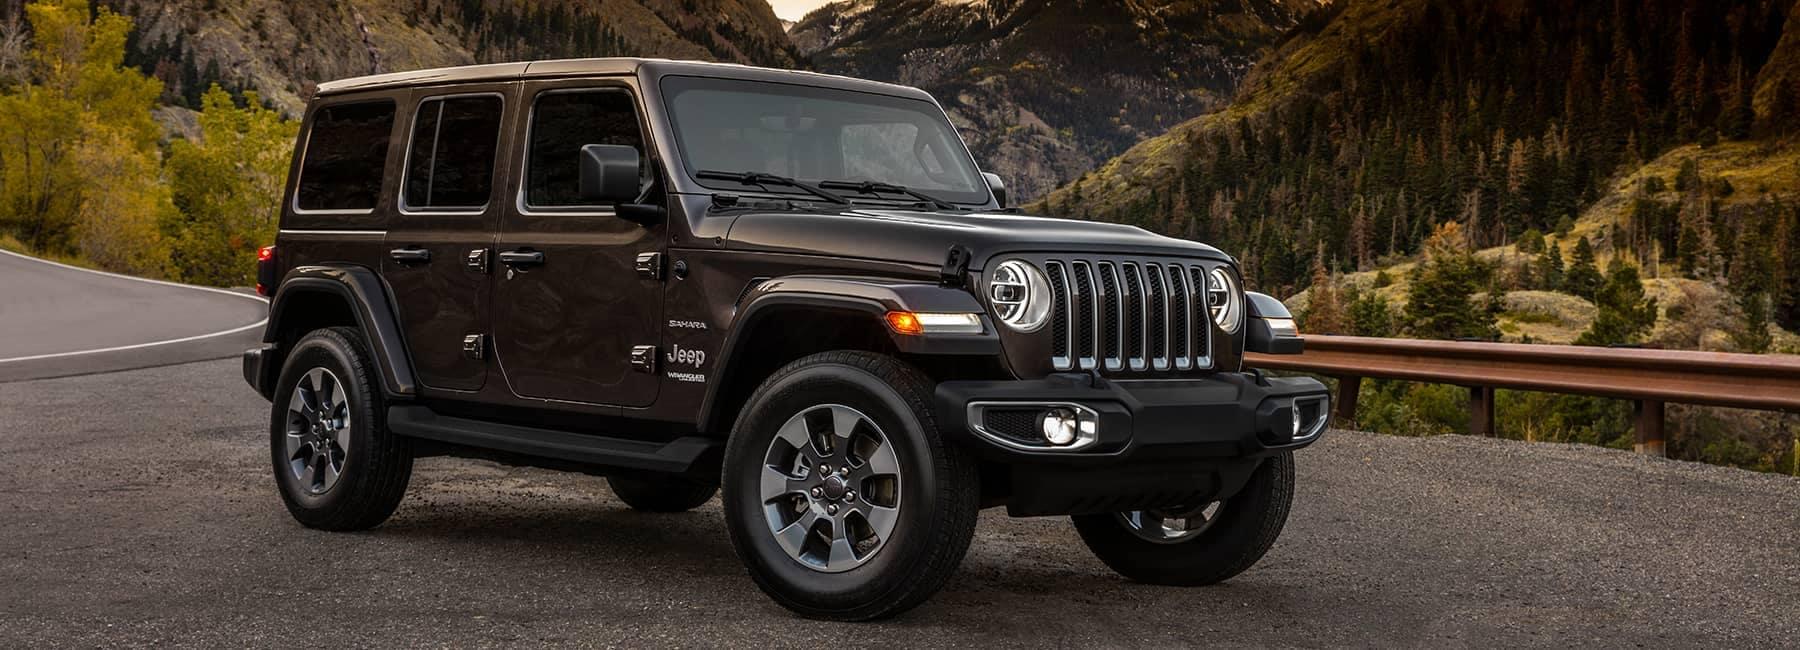 Jeep Wrangler Trim Levels Mansfield MA